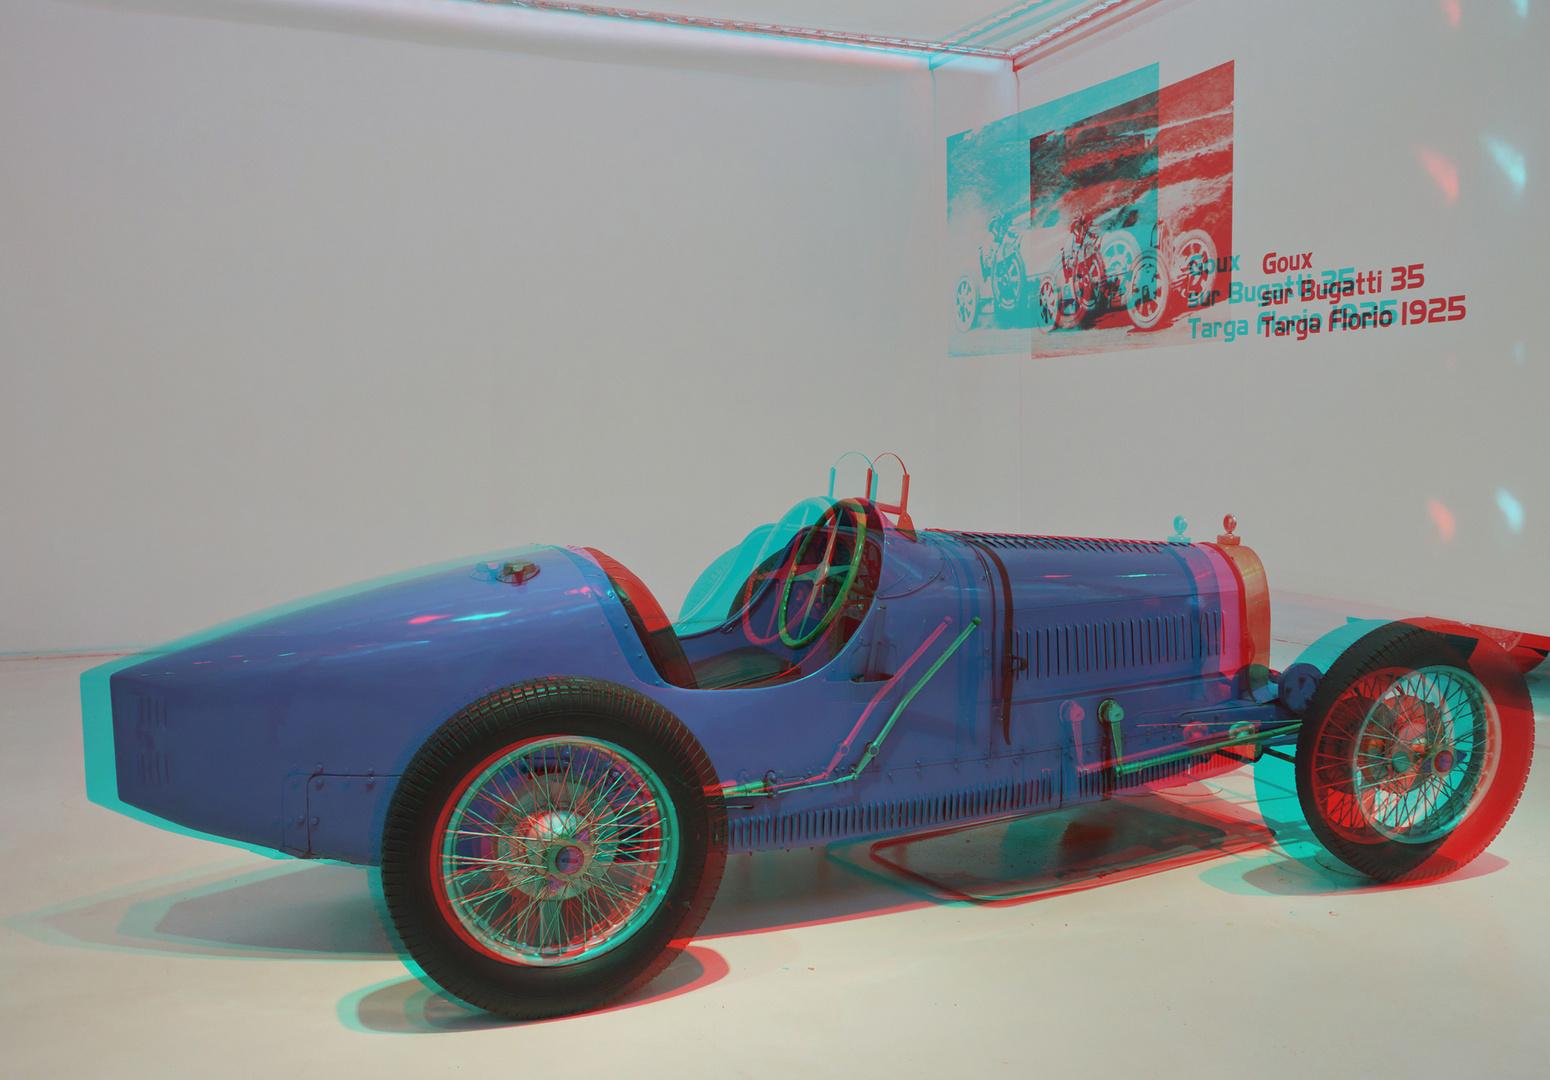 Bugatti 35 - Targa Florio 1925